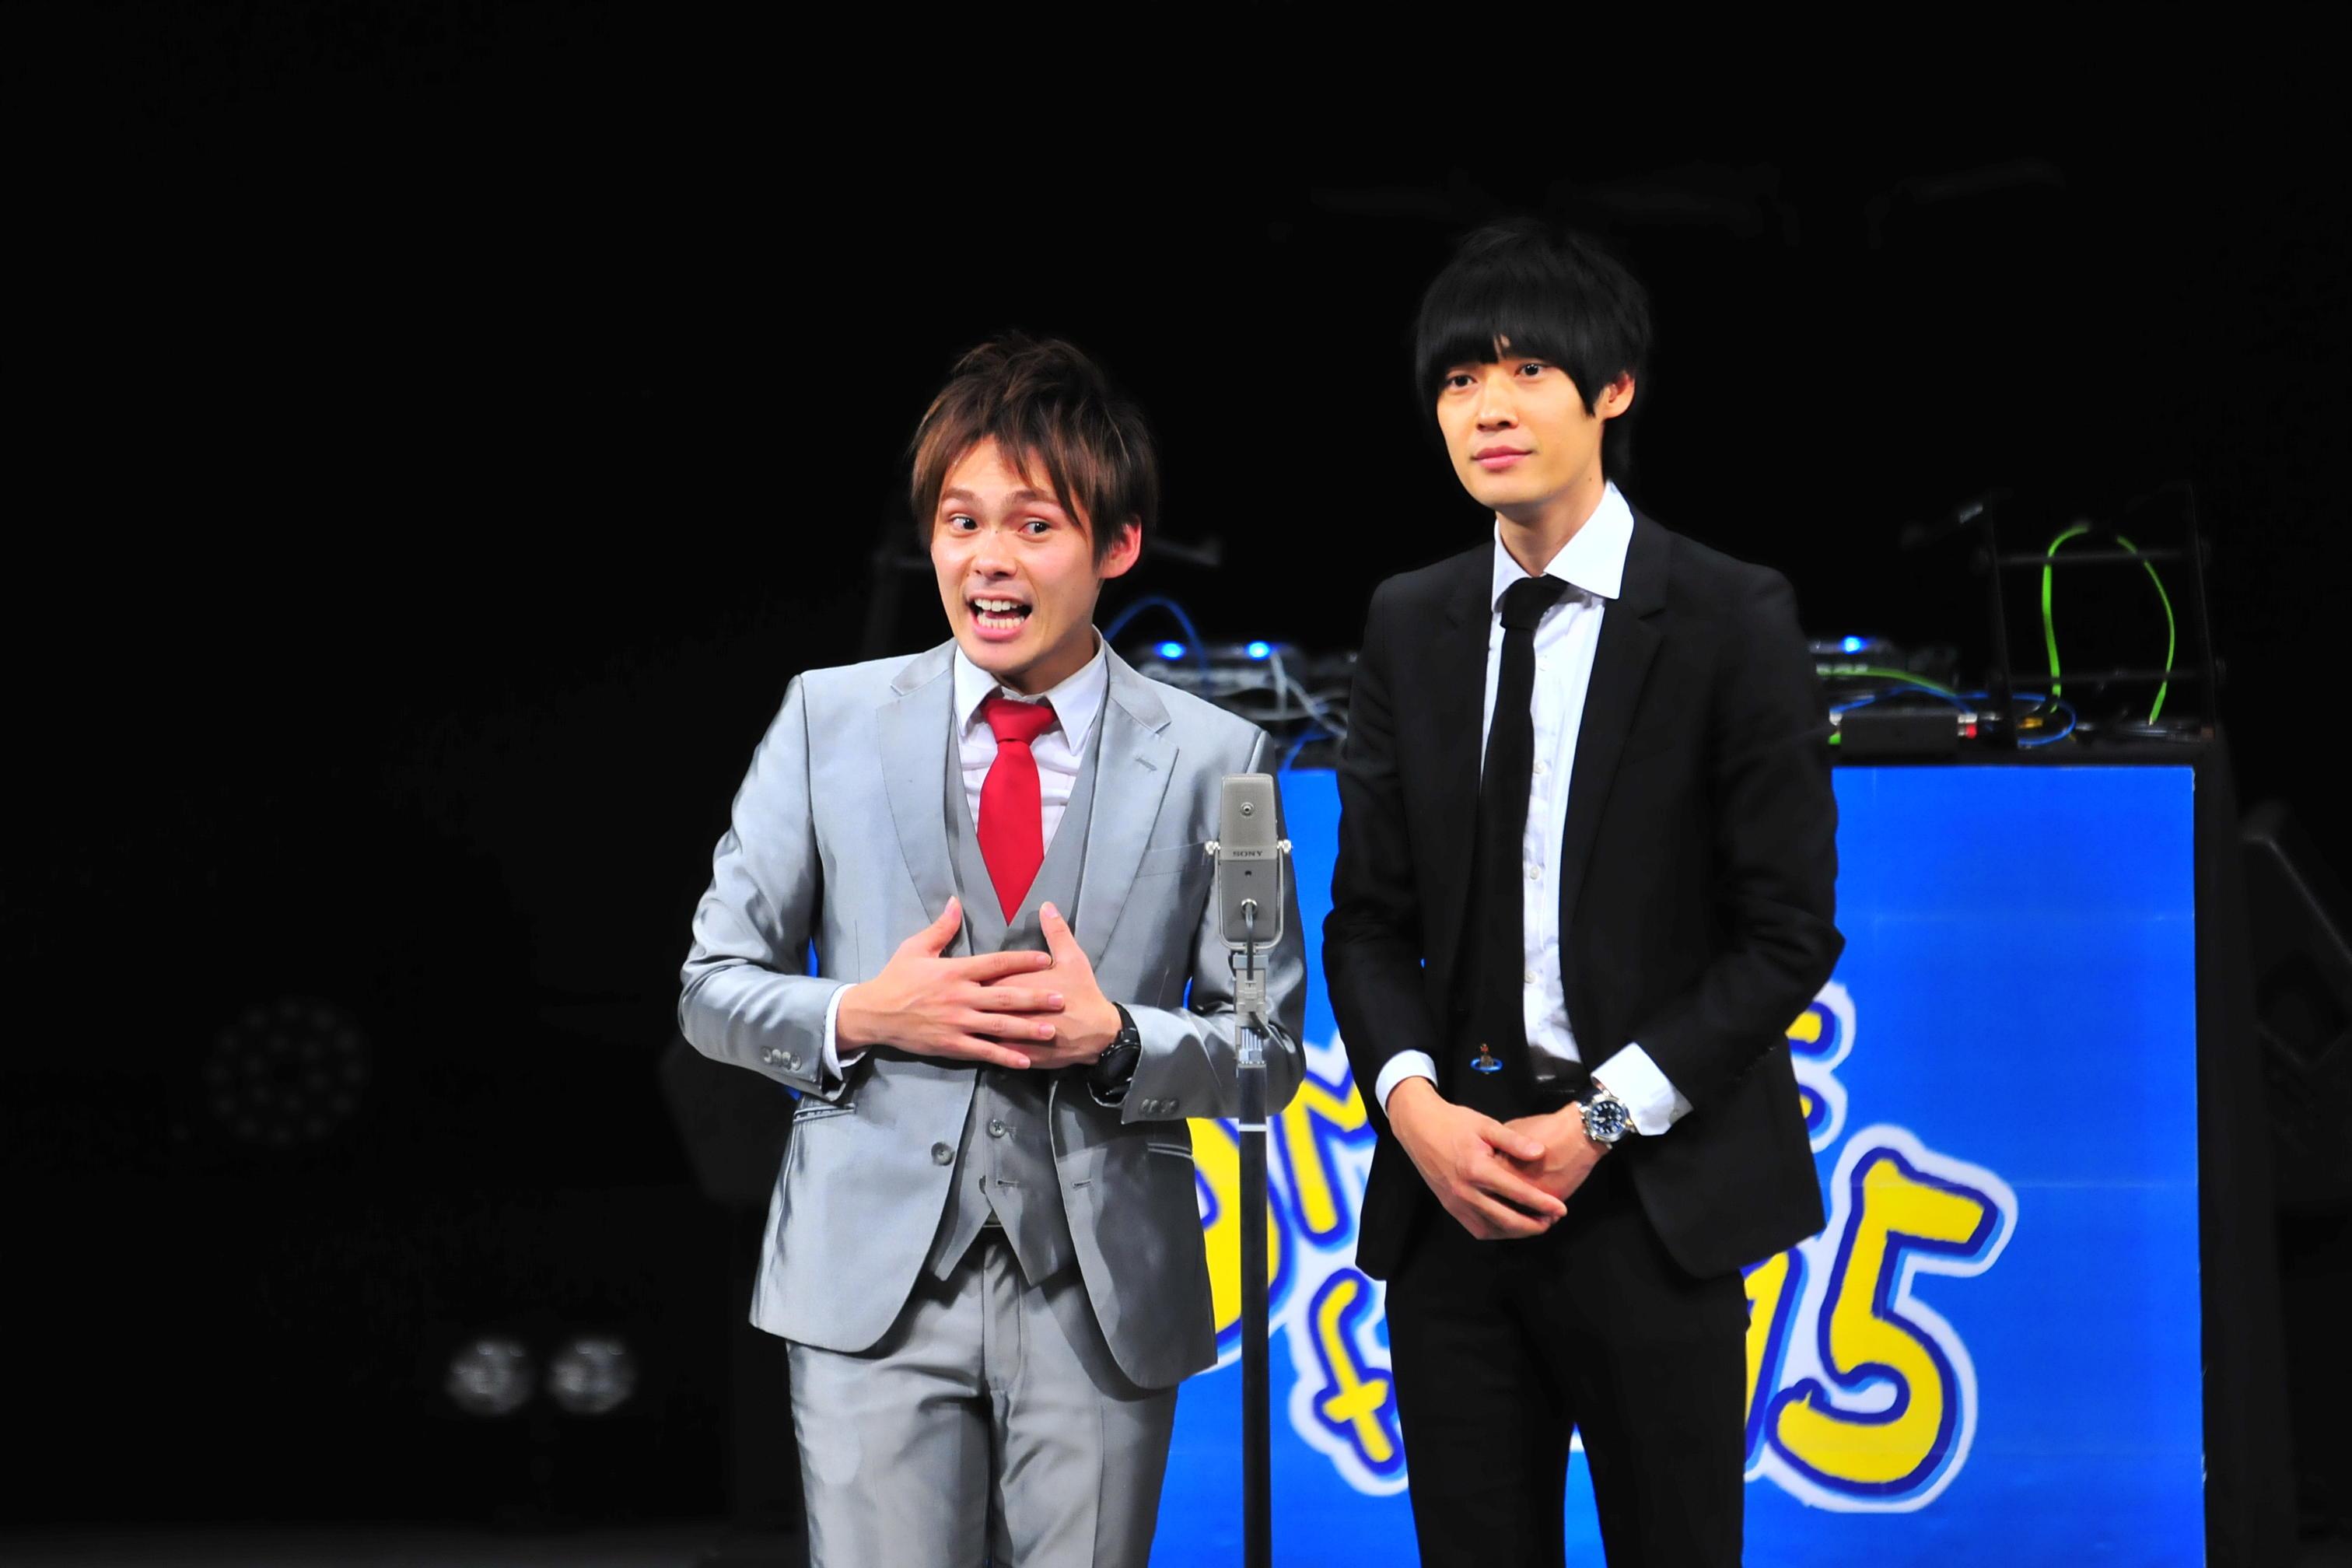 http://news.yoshimoto.co.jp/20151231142208-4aed71ca1470cd28df99010f6ba9bc25ac69df42.jpg